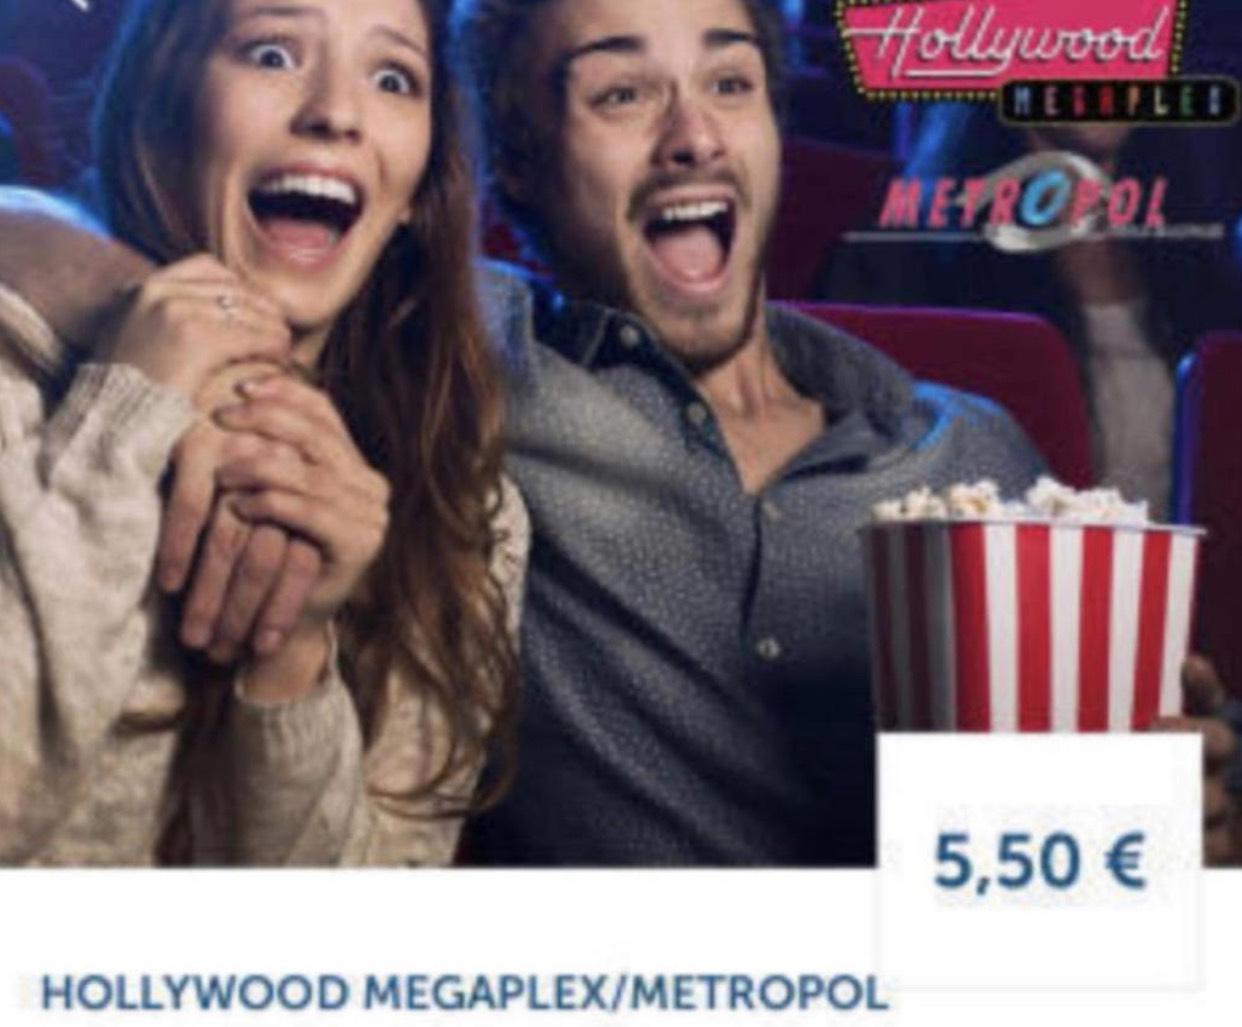 Hollywood Megaplex / Metropol: Montag Kino Tickets um 5,50 €